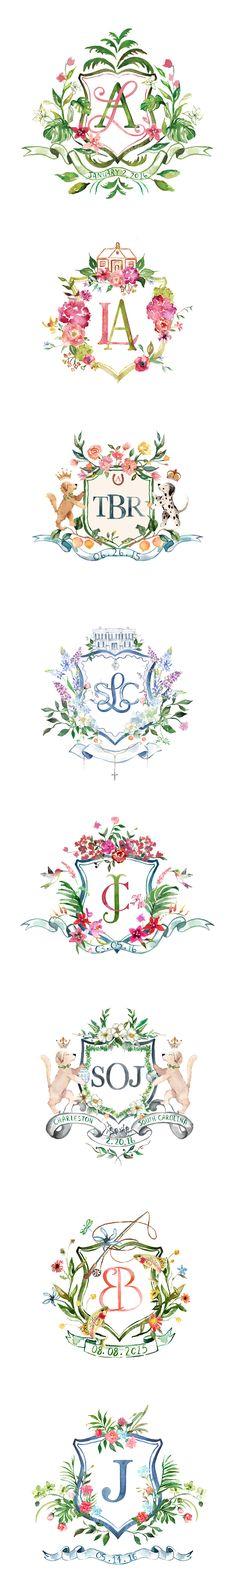 Arabella June: Watercolor Wedding Crests